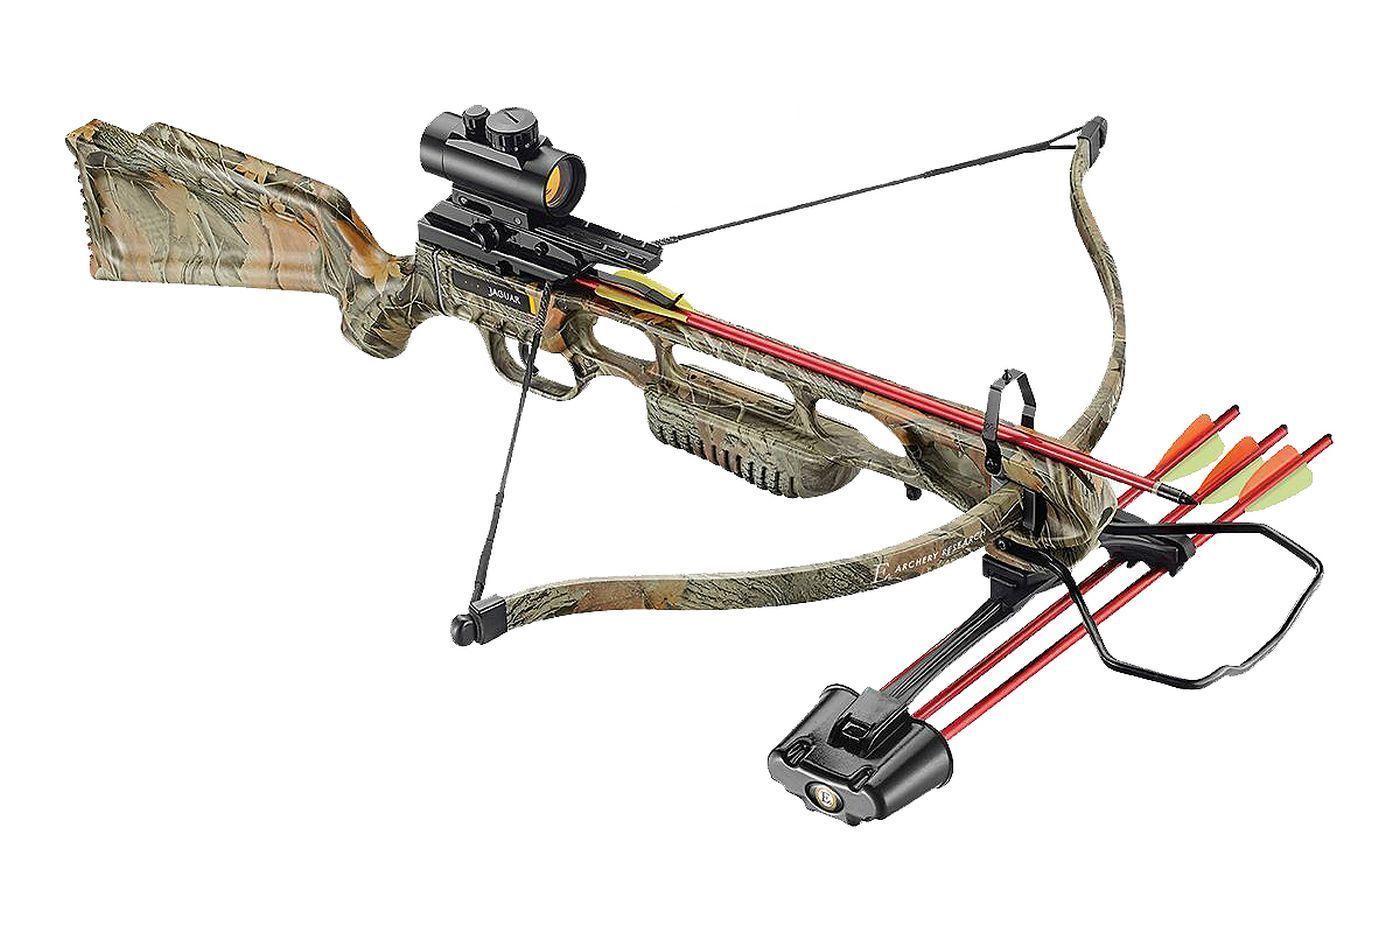 Ek Archery Jag 1 Deluxe Camo Armbrust